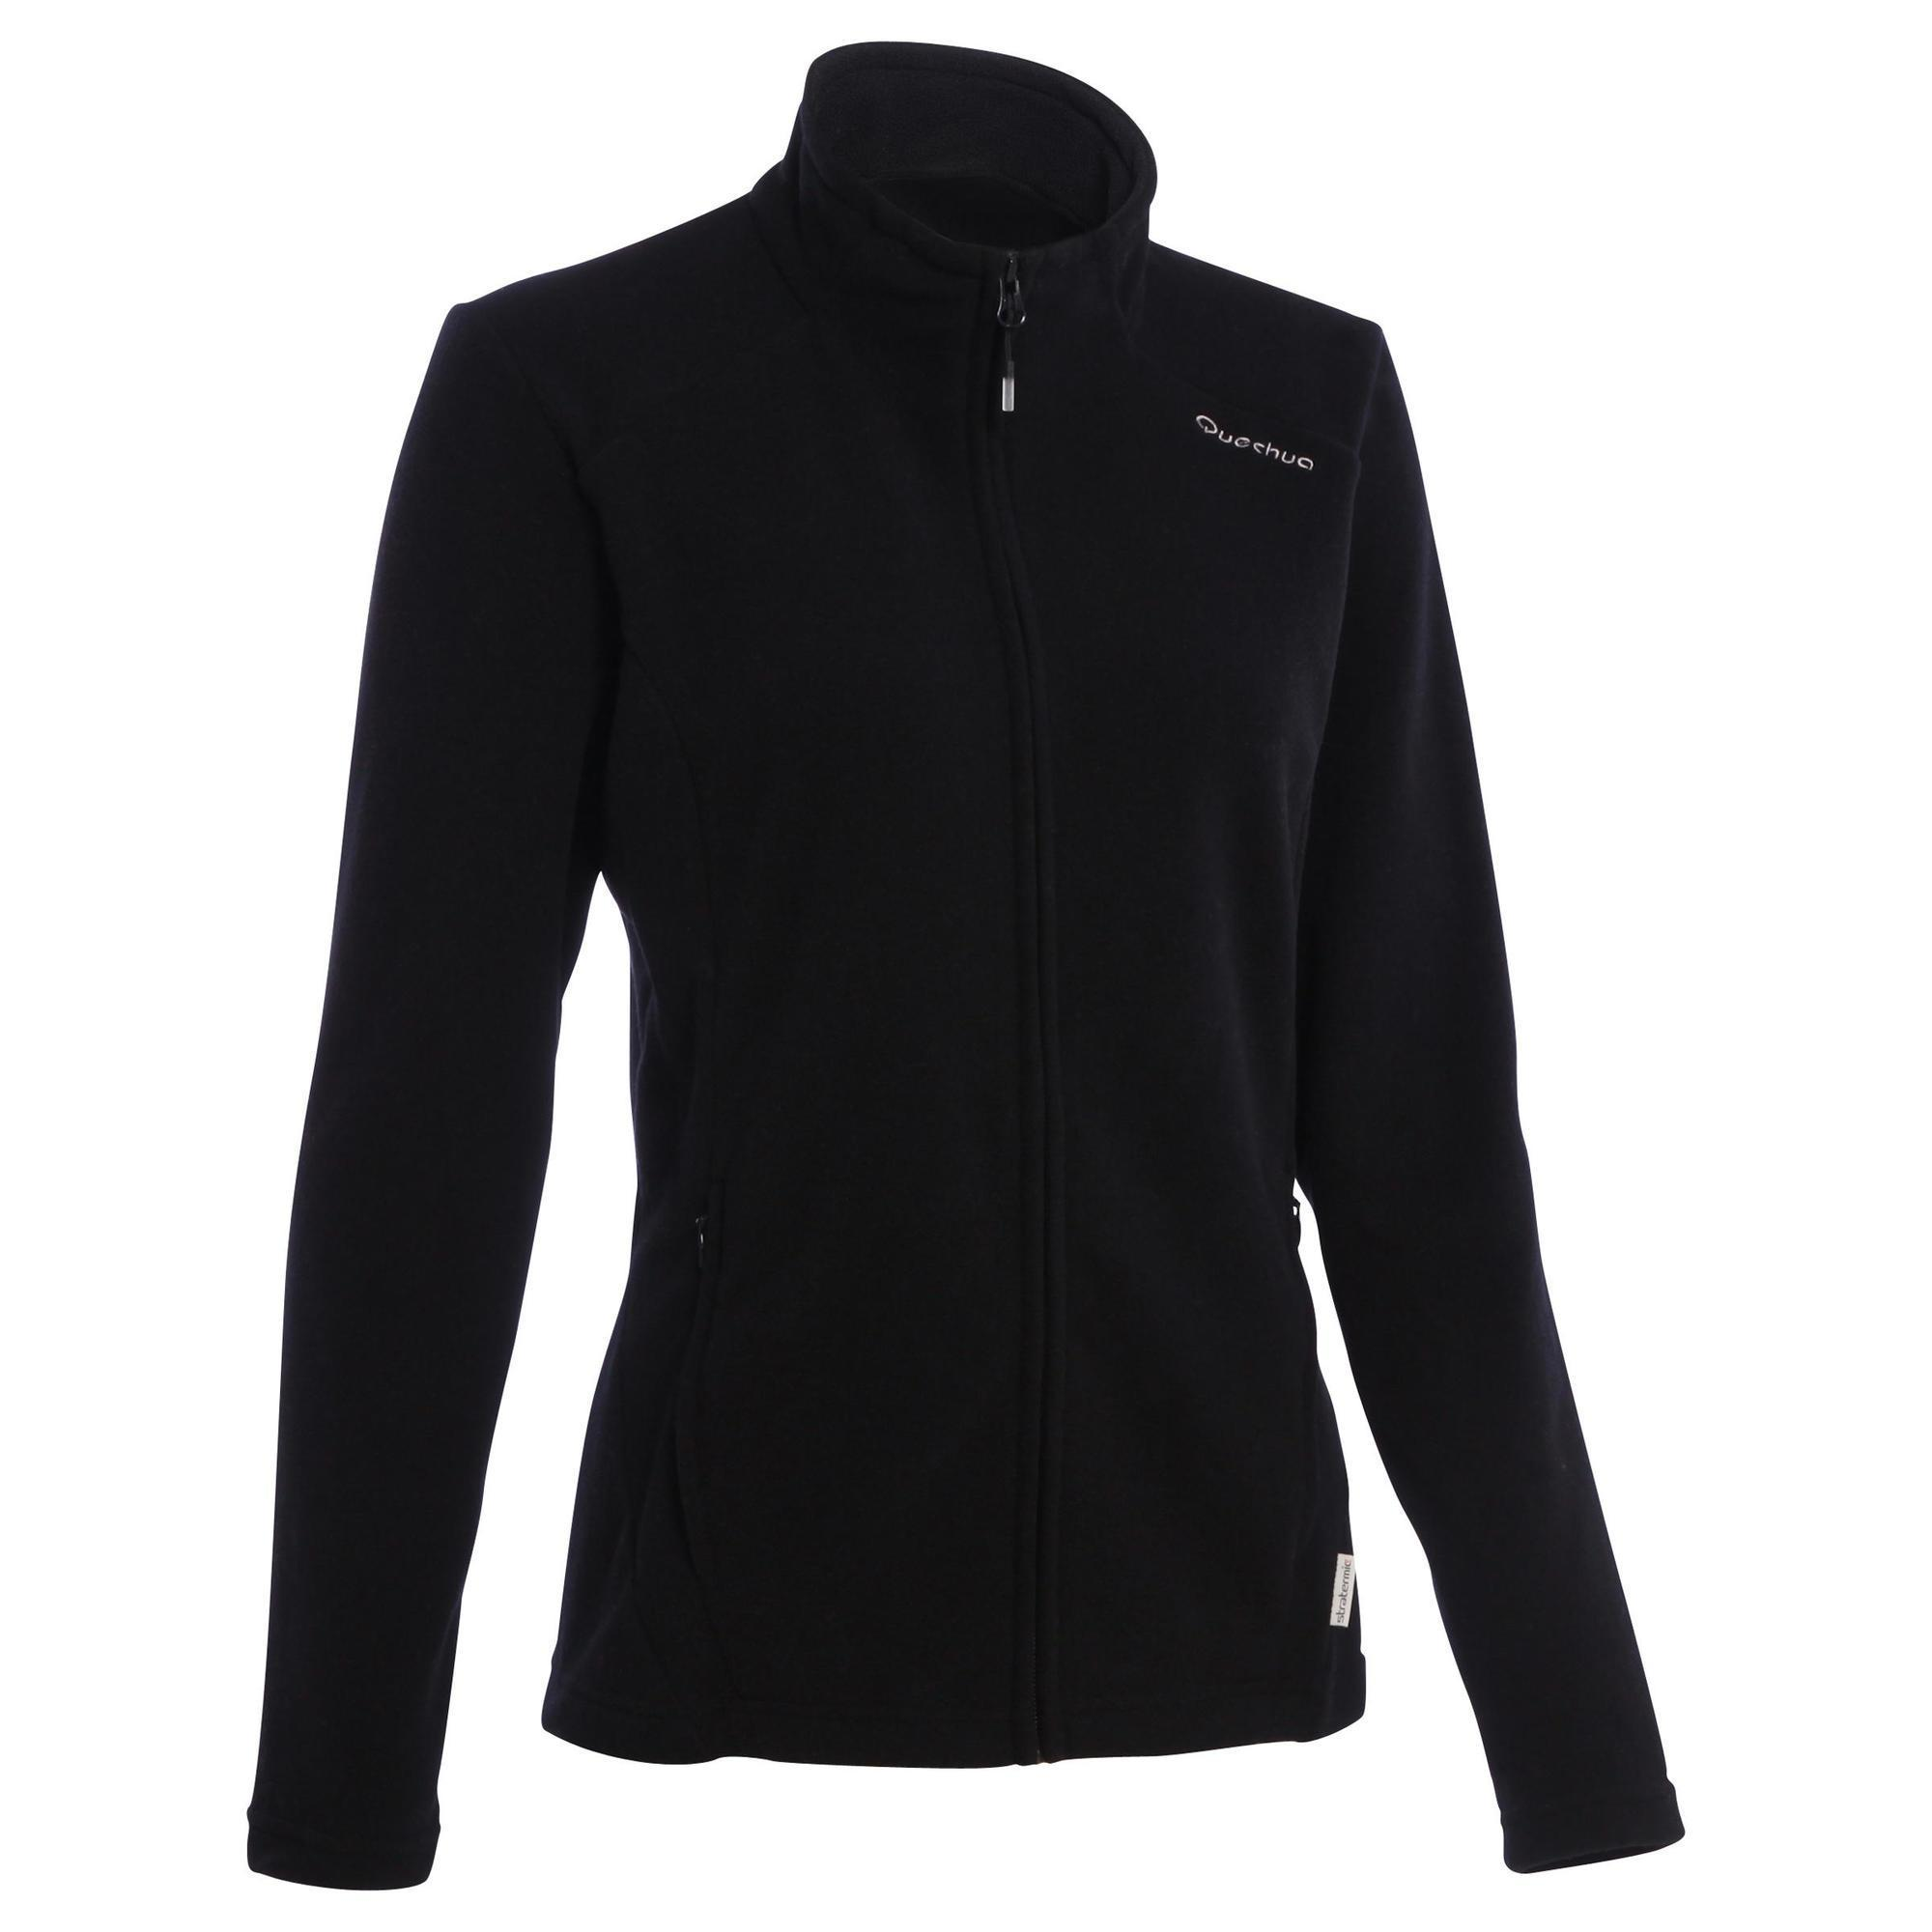 Fleecejacke Bergwandern MH120 Damen schwarz | Bekleidung > Jacken > Fleecejacken | Schwarz | Quechua